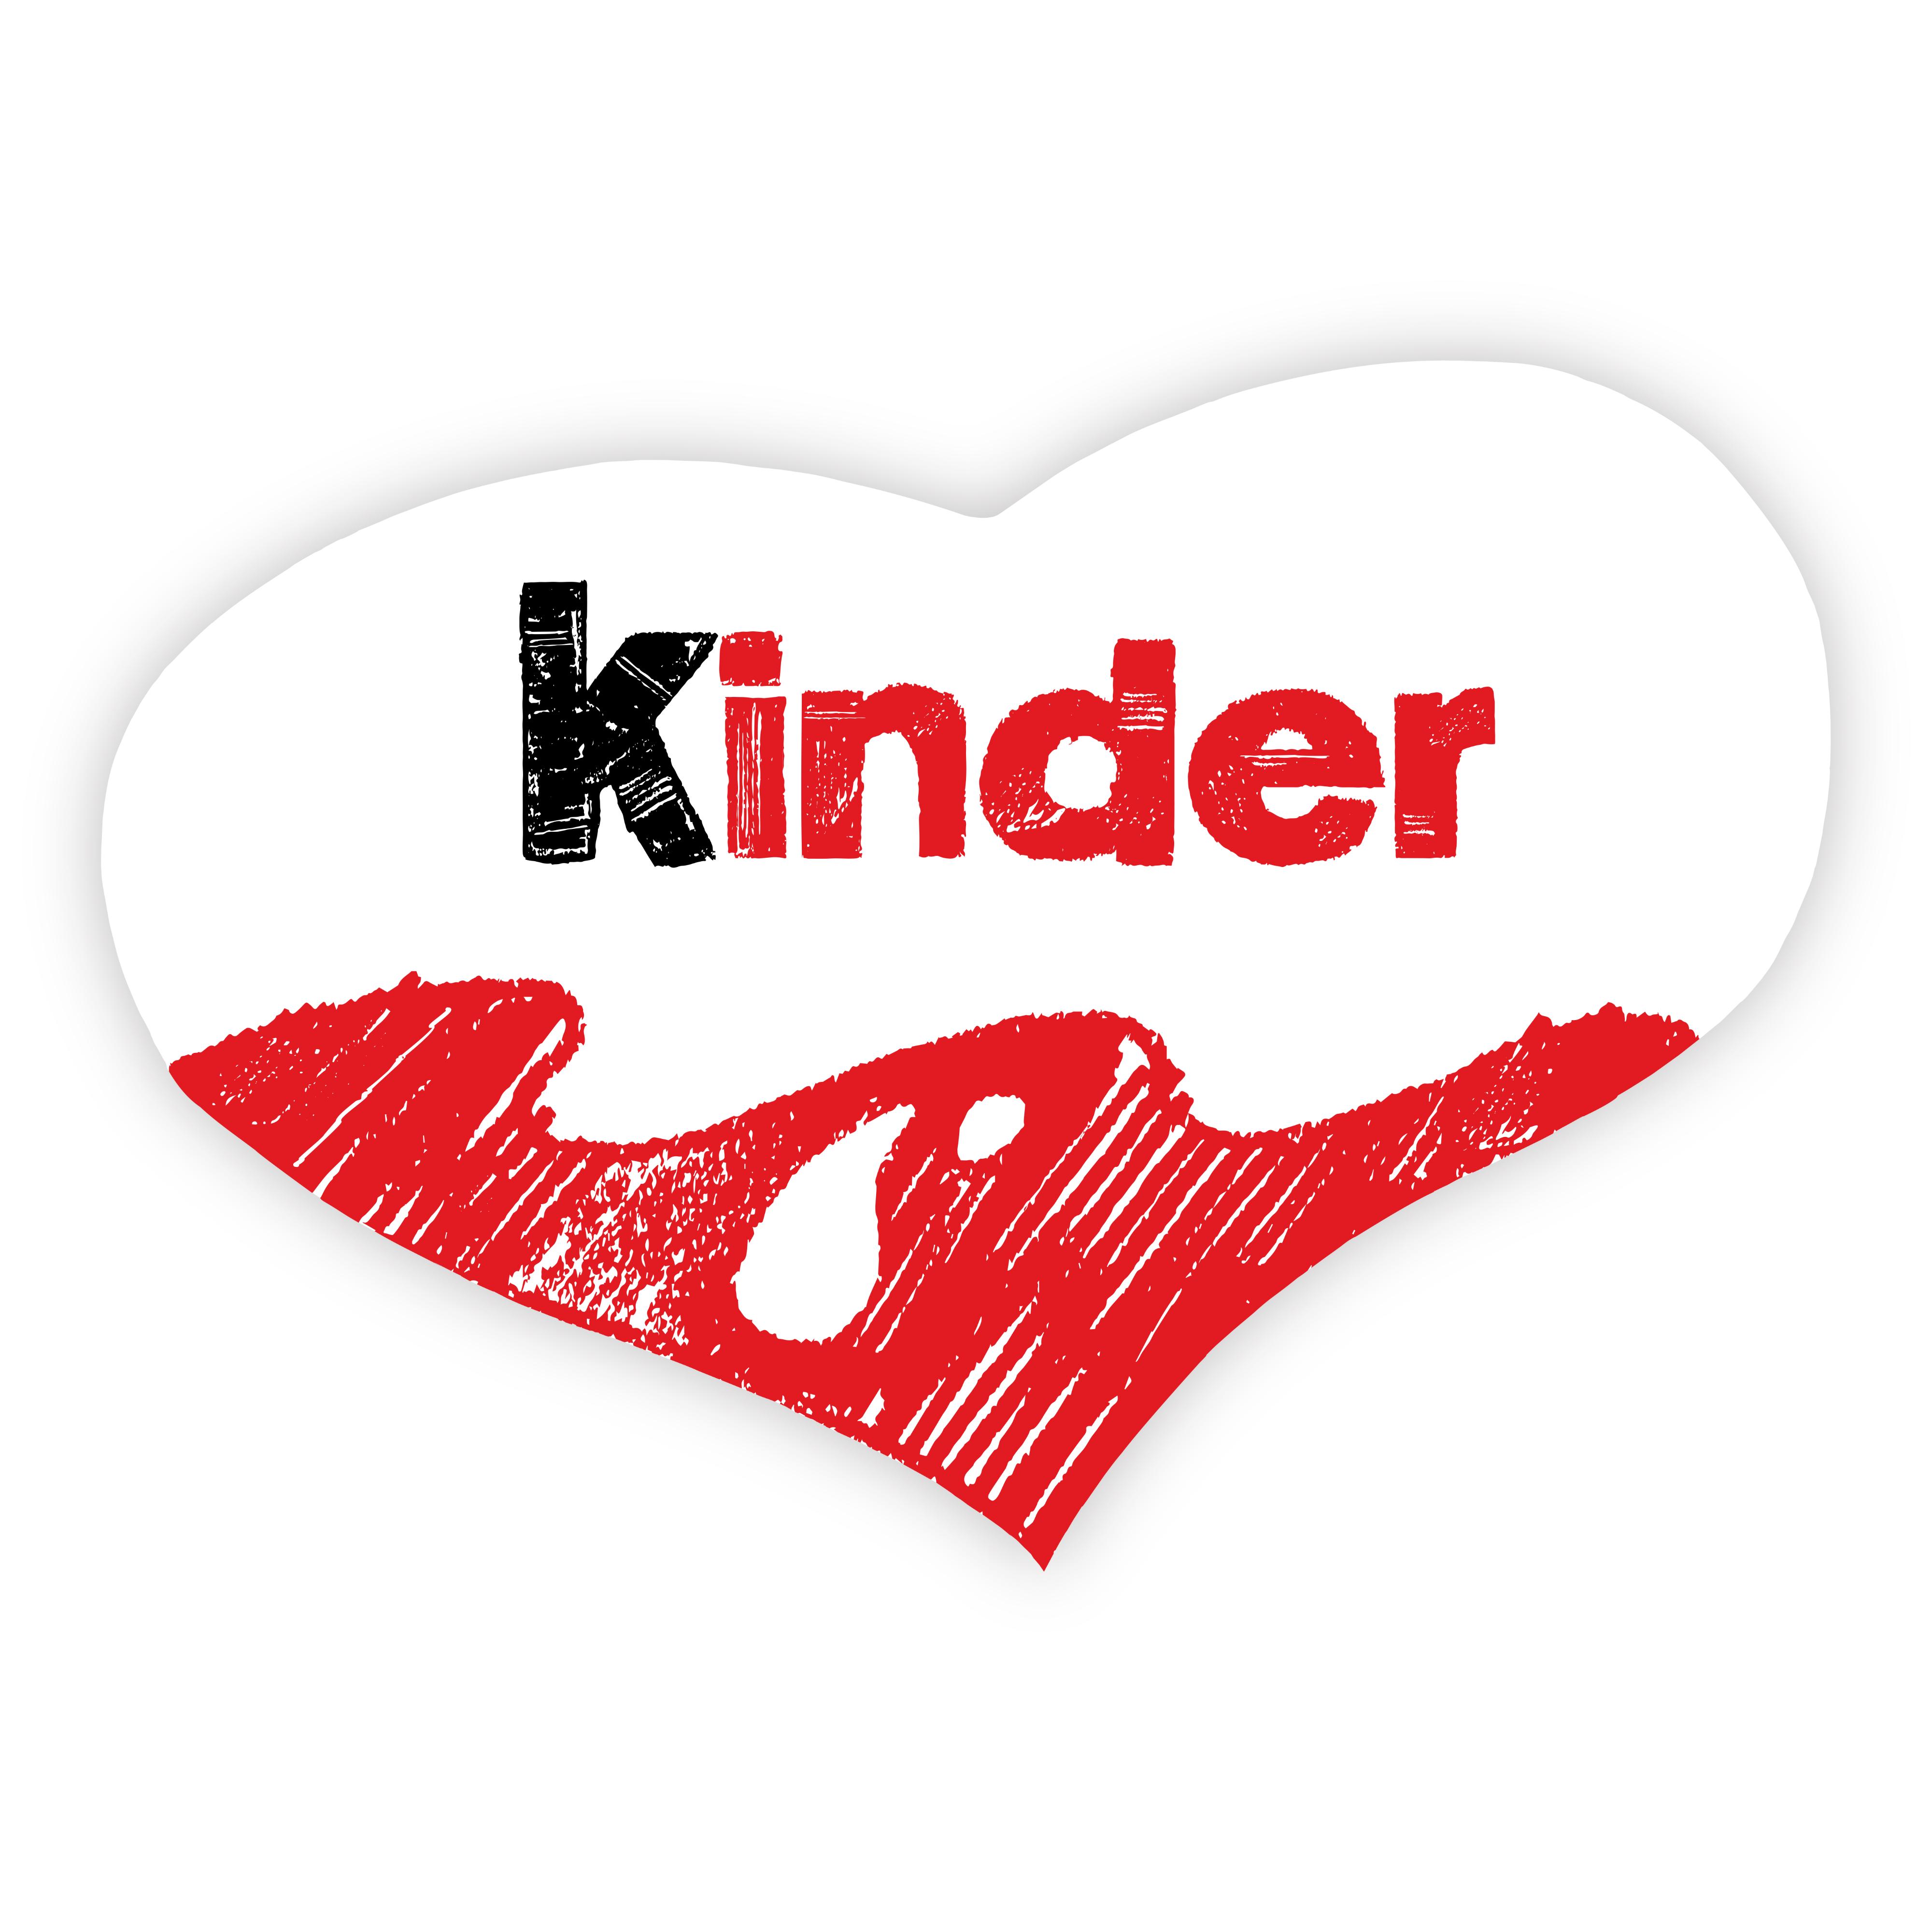 User image from kinder®